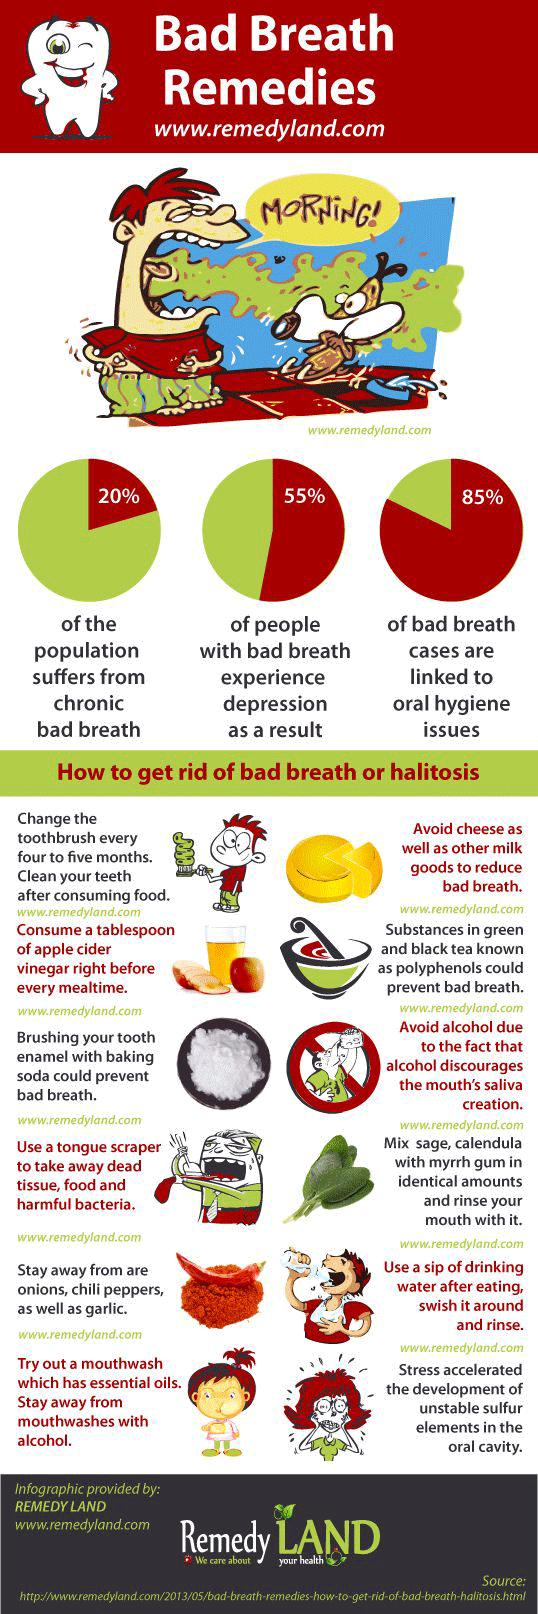 Bad breath remedies infographic